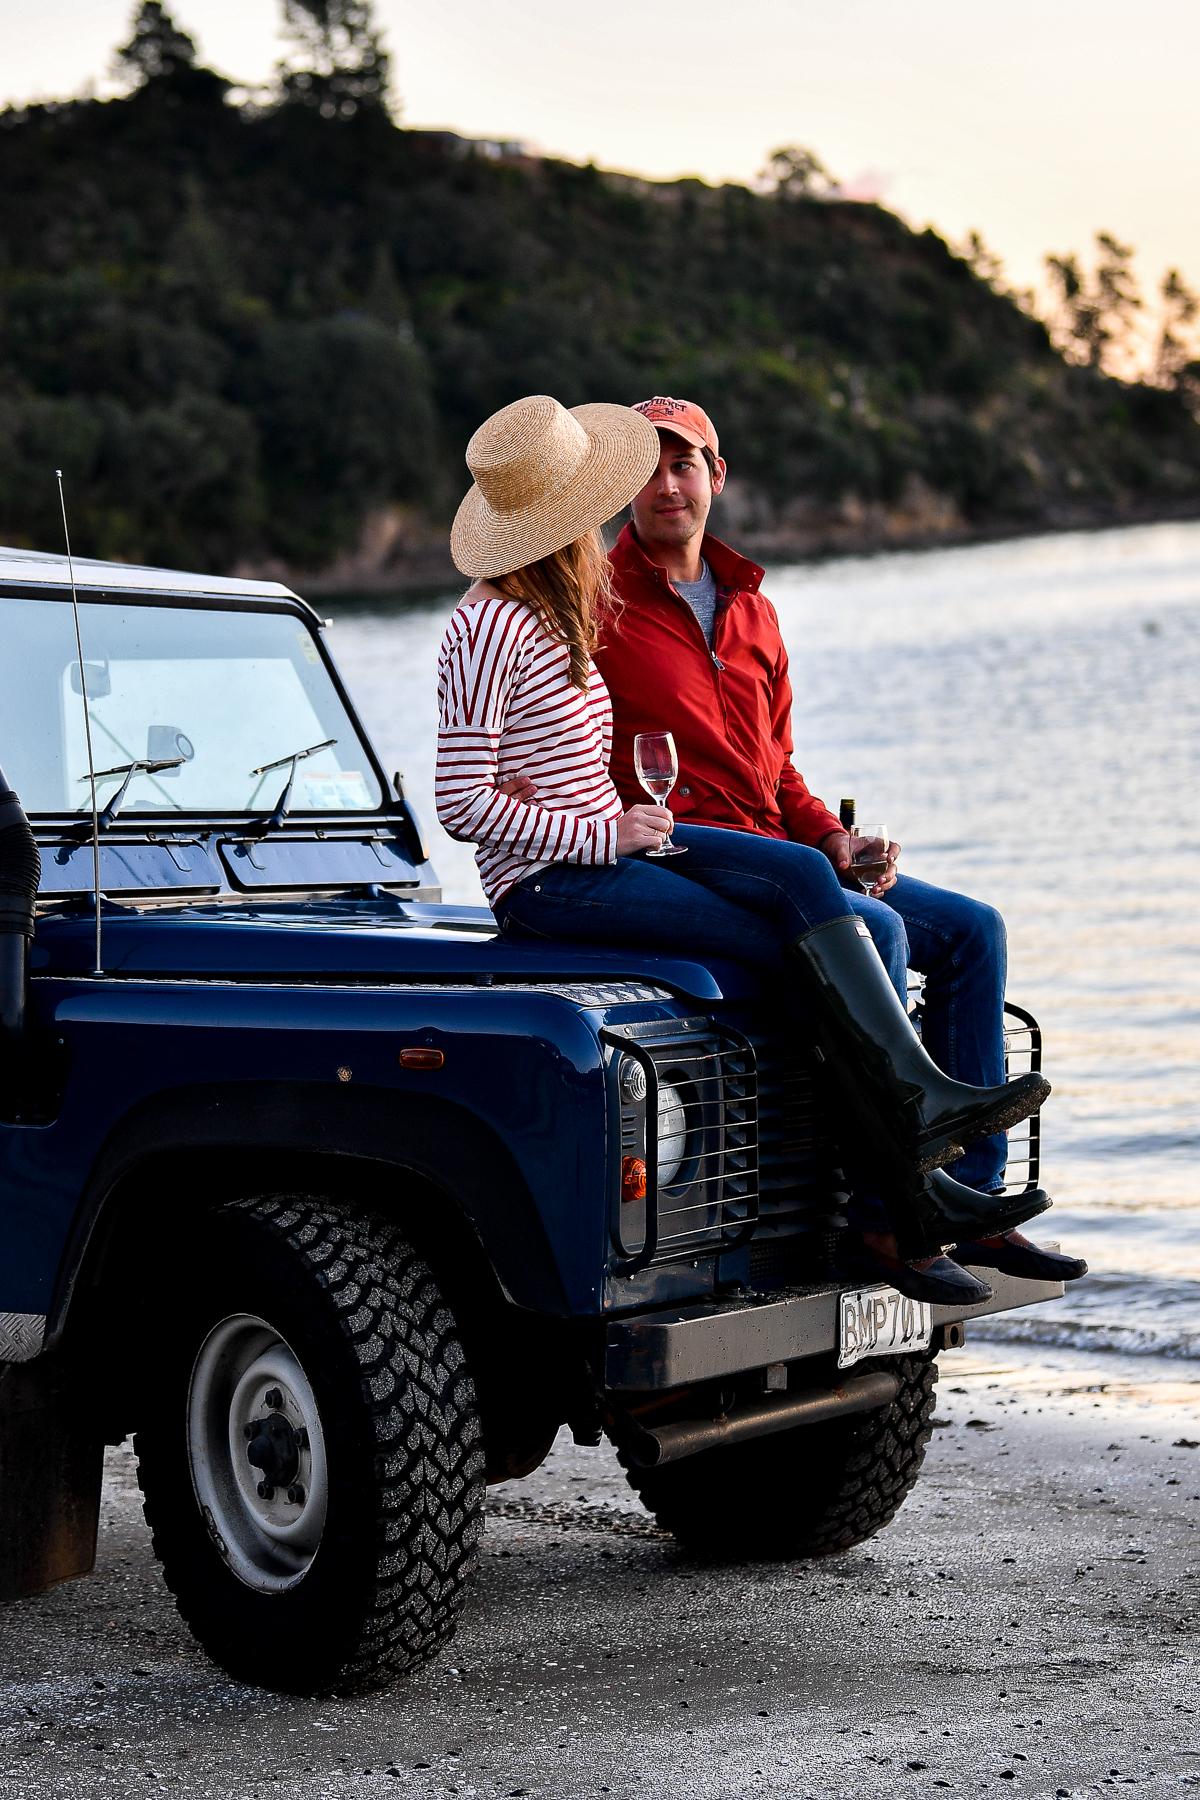 Stacie Flinner Land Rover Camping New Zealand-24.jpg